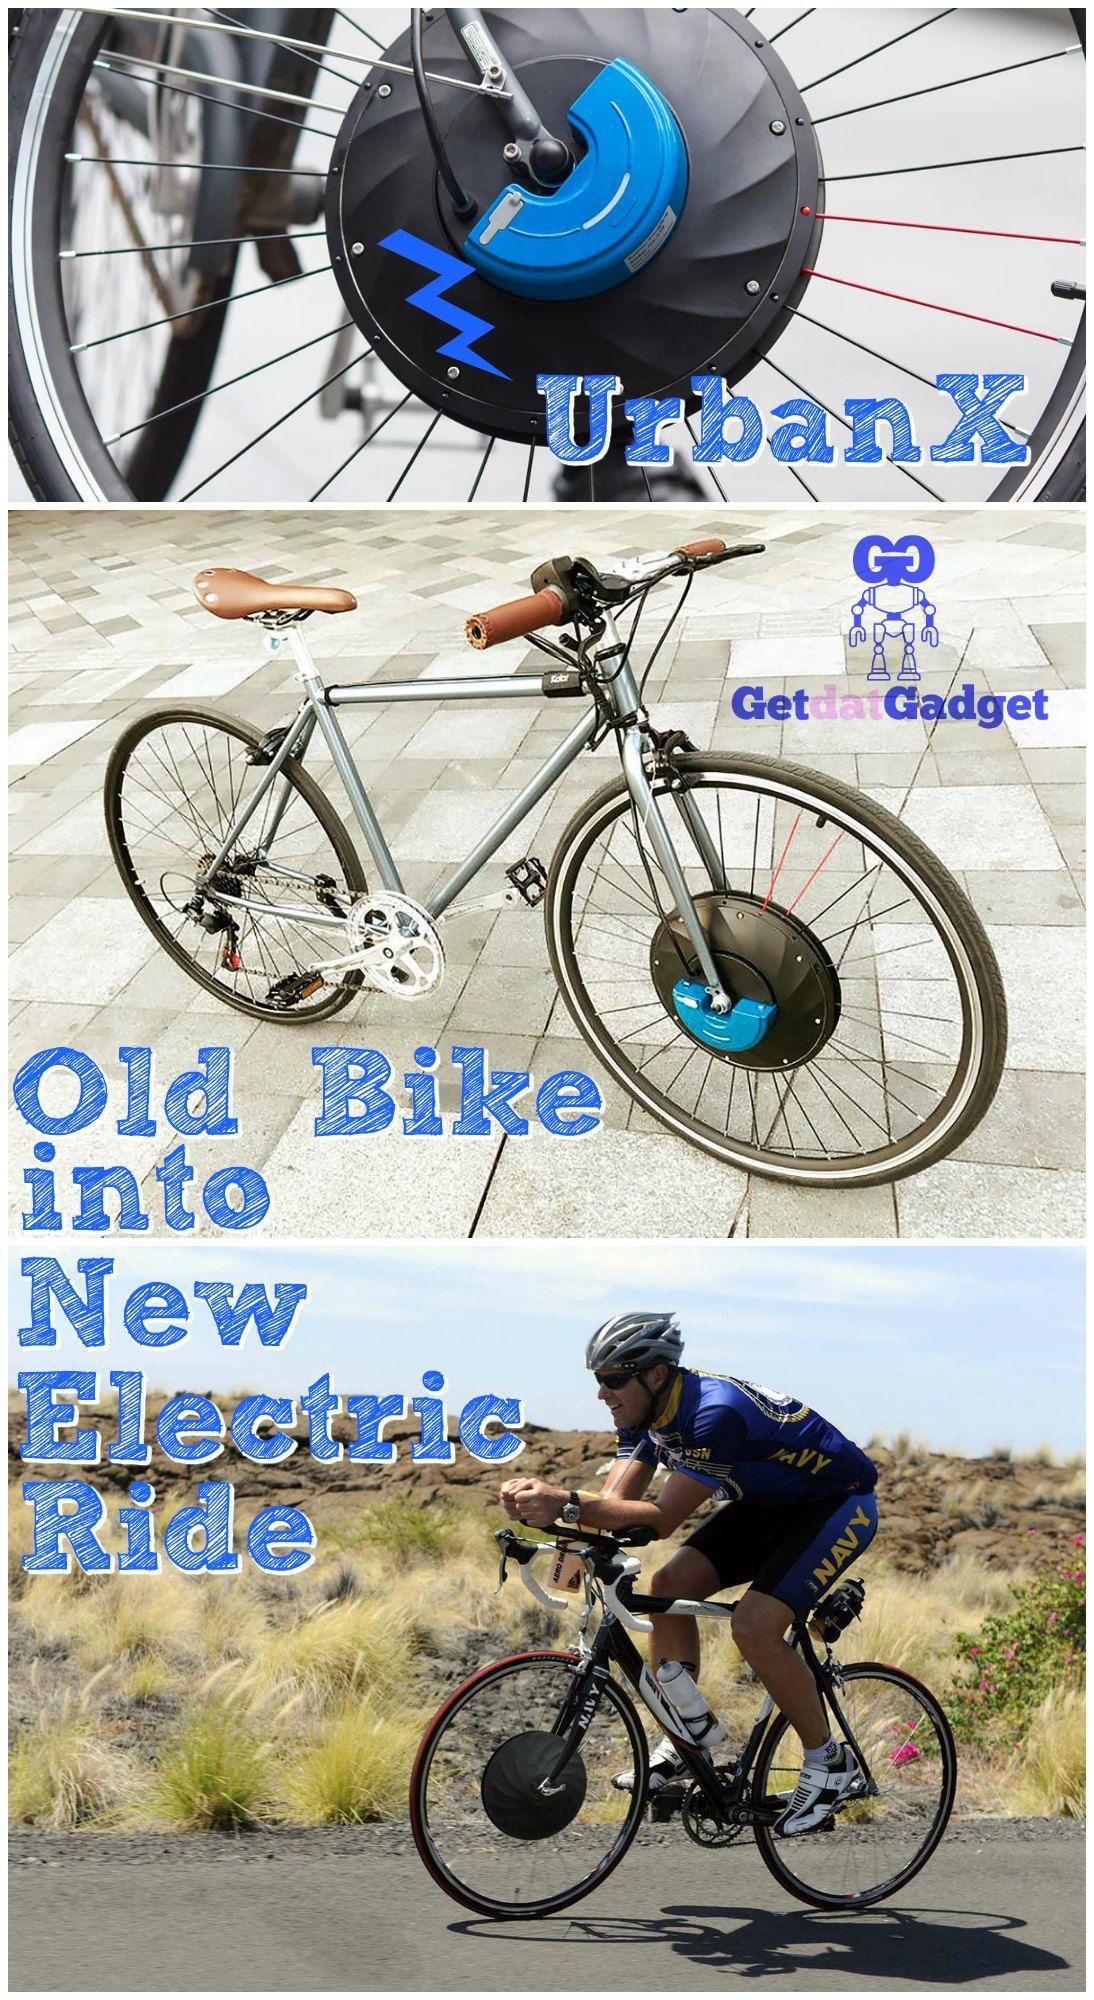 Convert Any Bike Into An Electric Bike With Urbanx Bike Cool